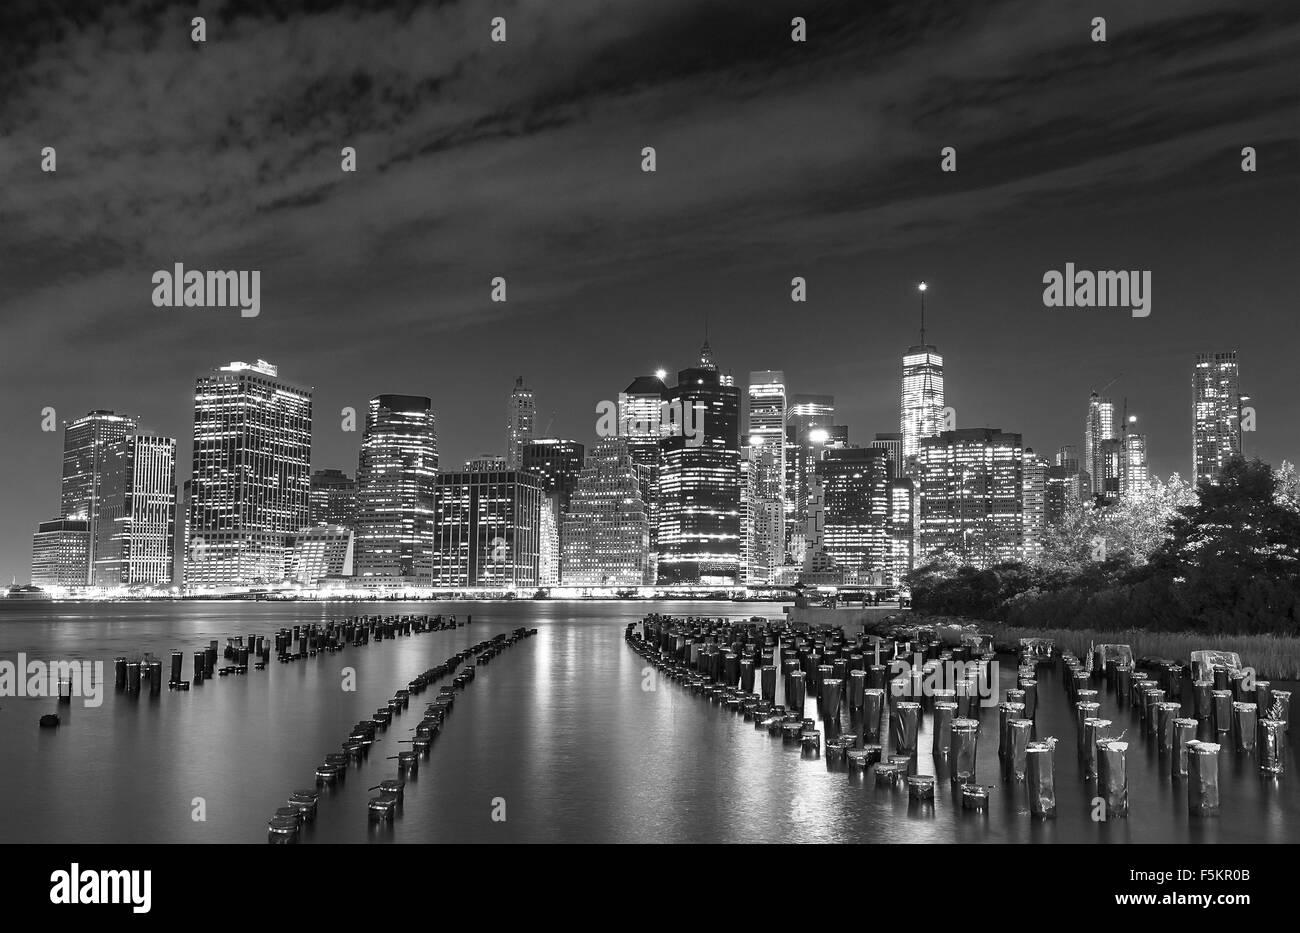 Black and white photo of Manhattan waterfront at night, New York City, USA. - Stock Image